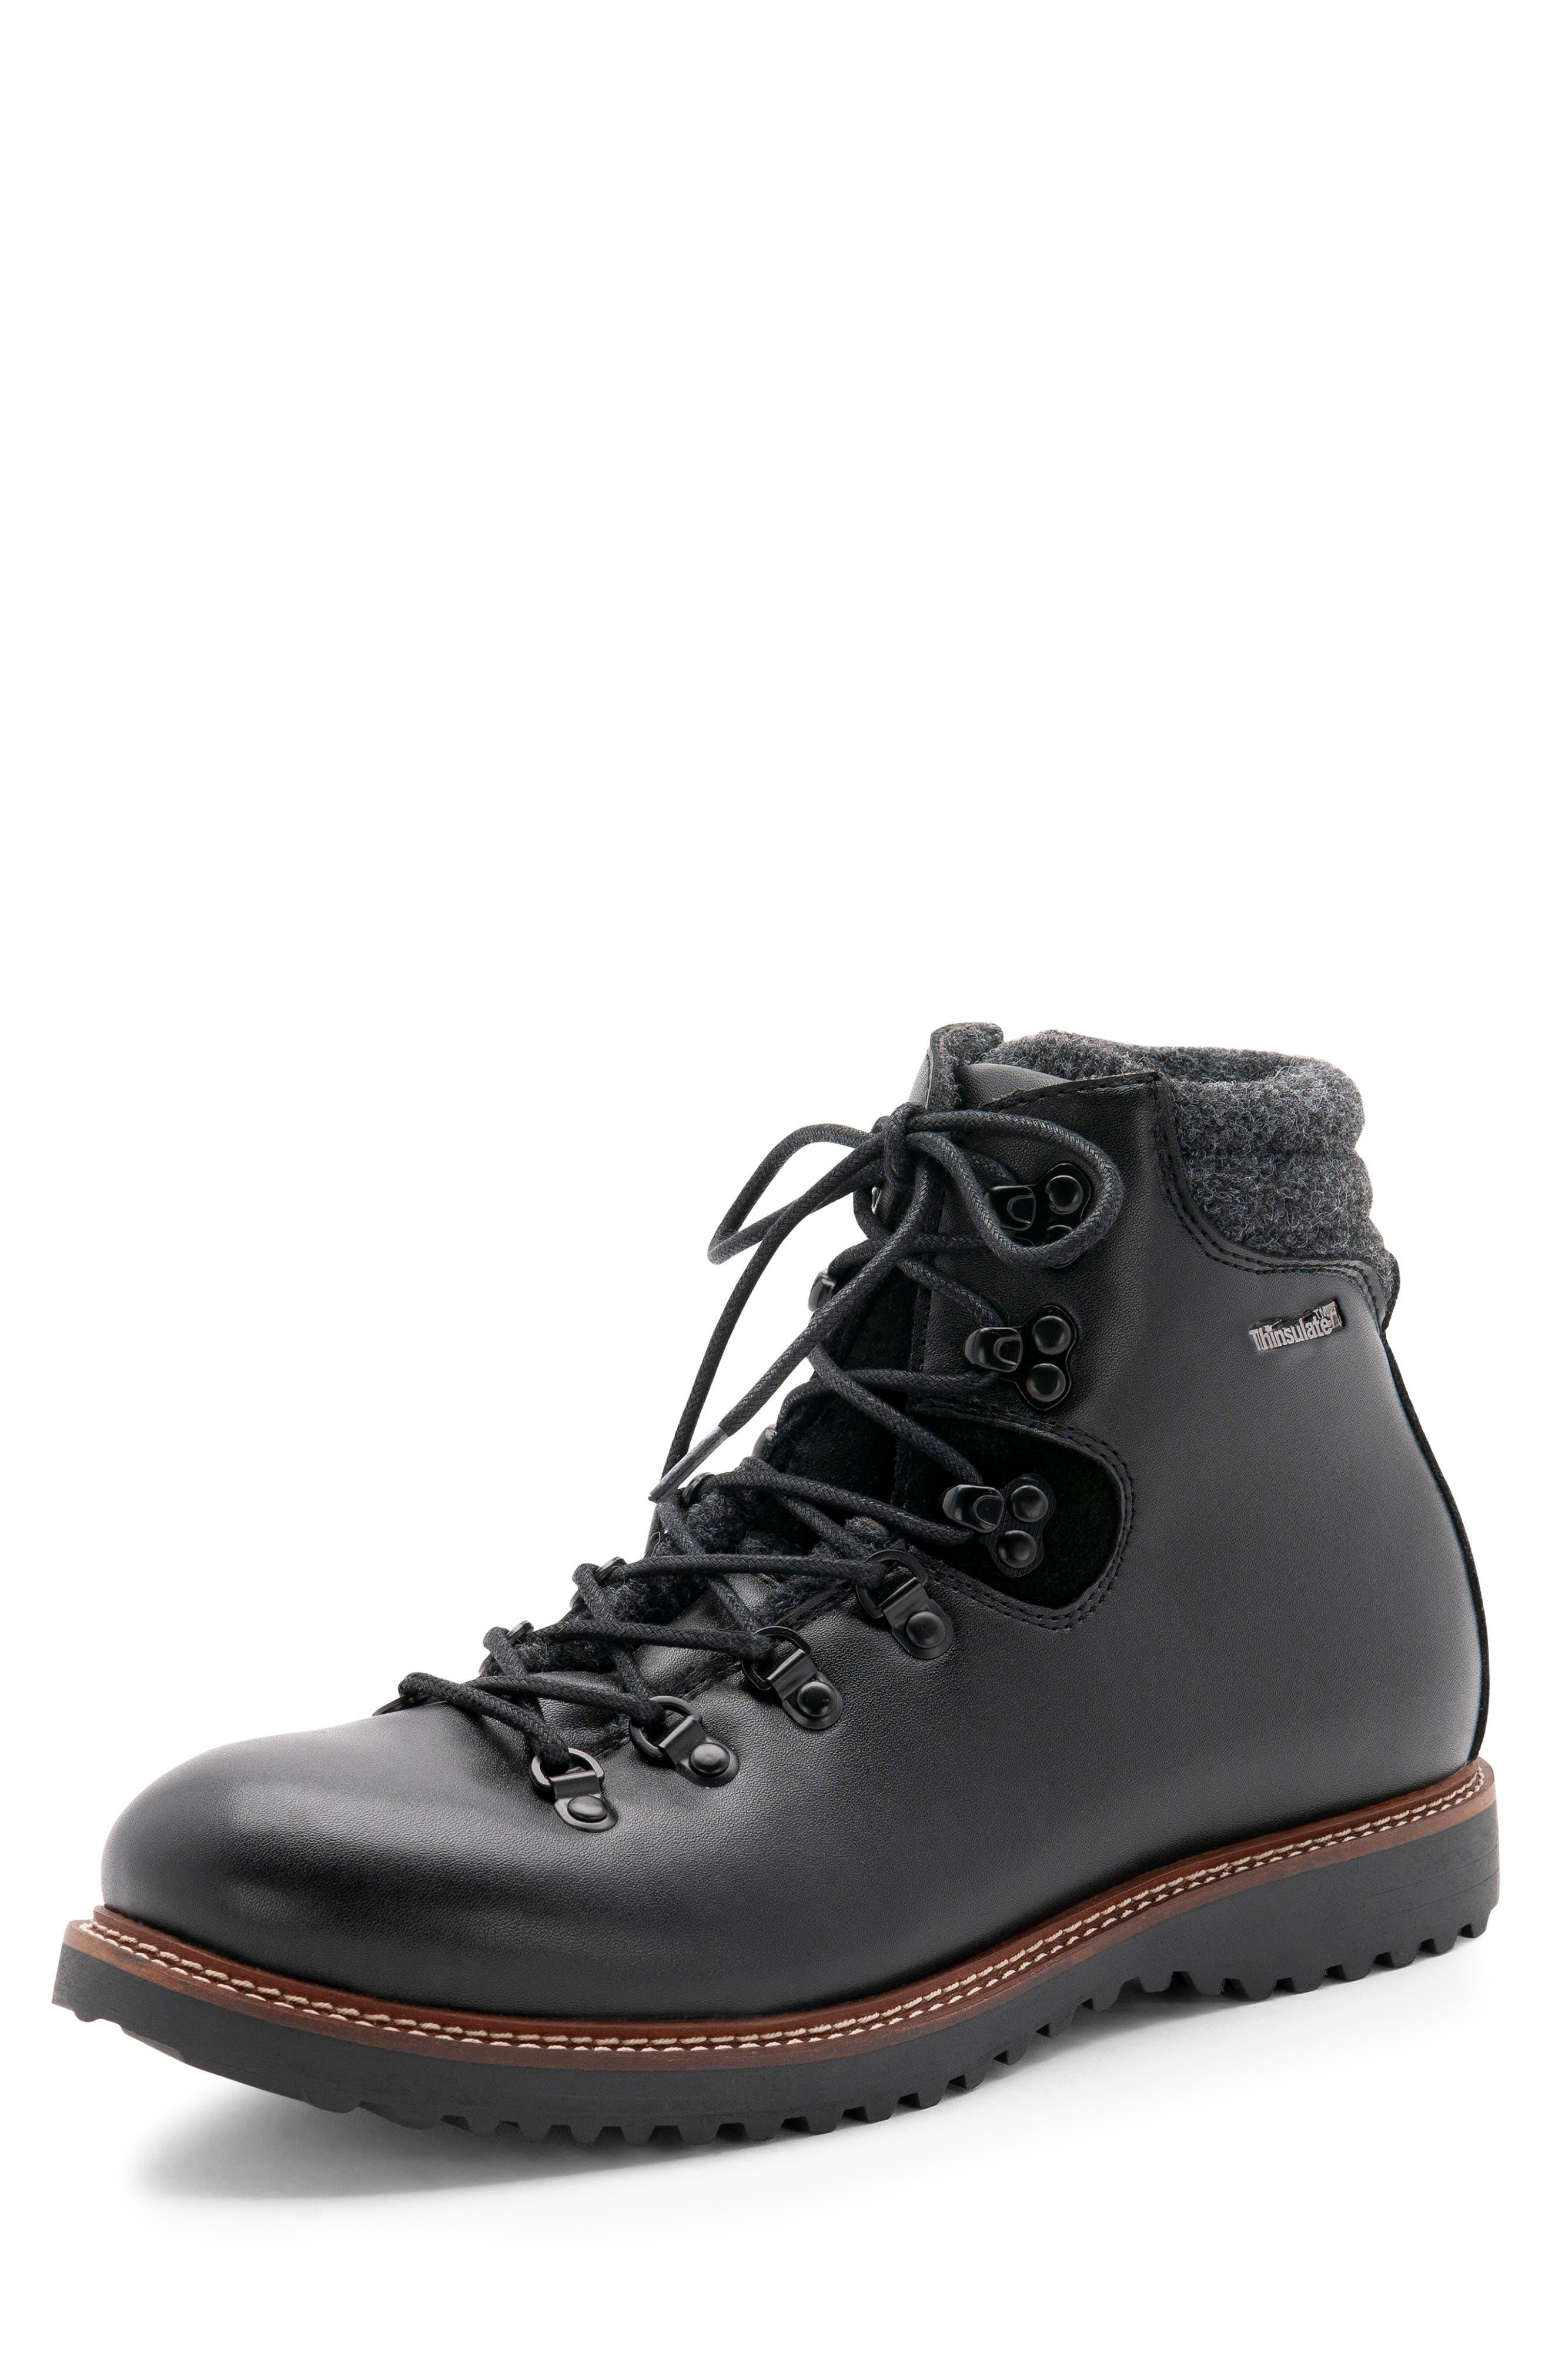 Morgan Waterproof Plain Toe Boot,                             Alternate thumbnail 8, color,                             BLACK LEATHER